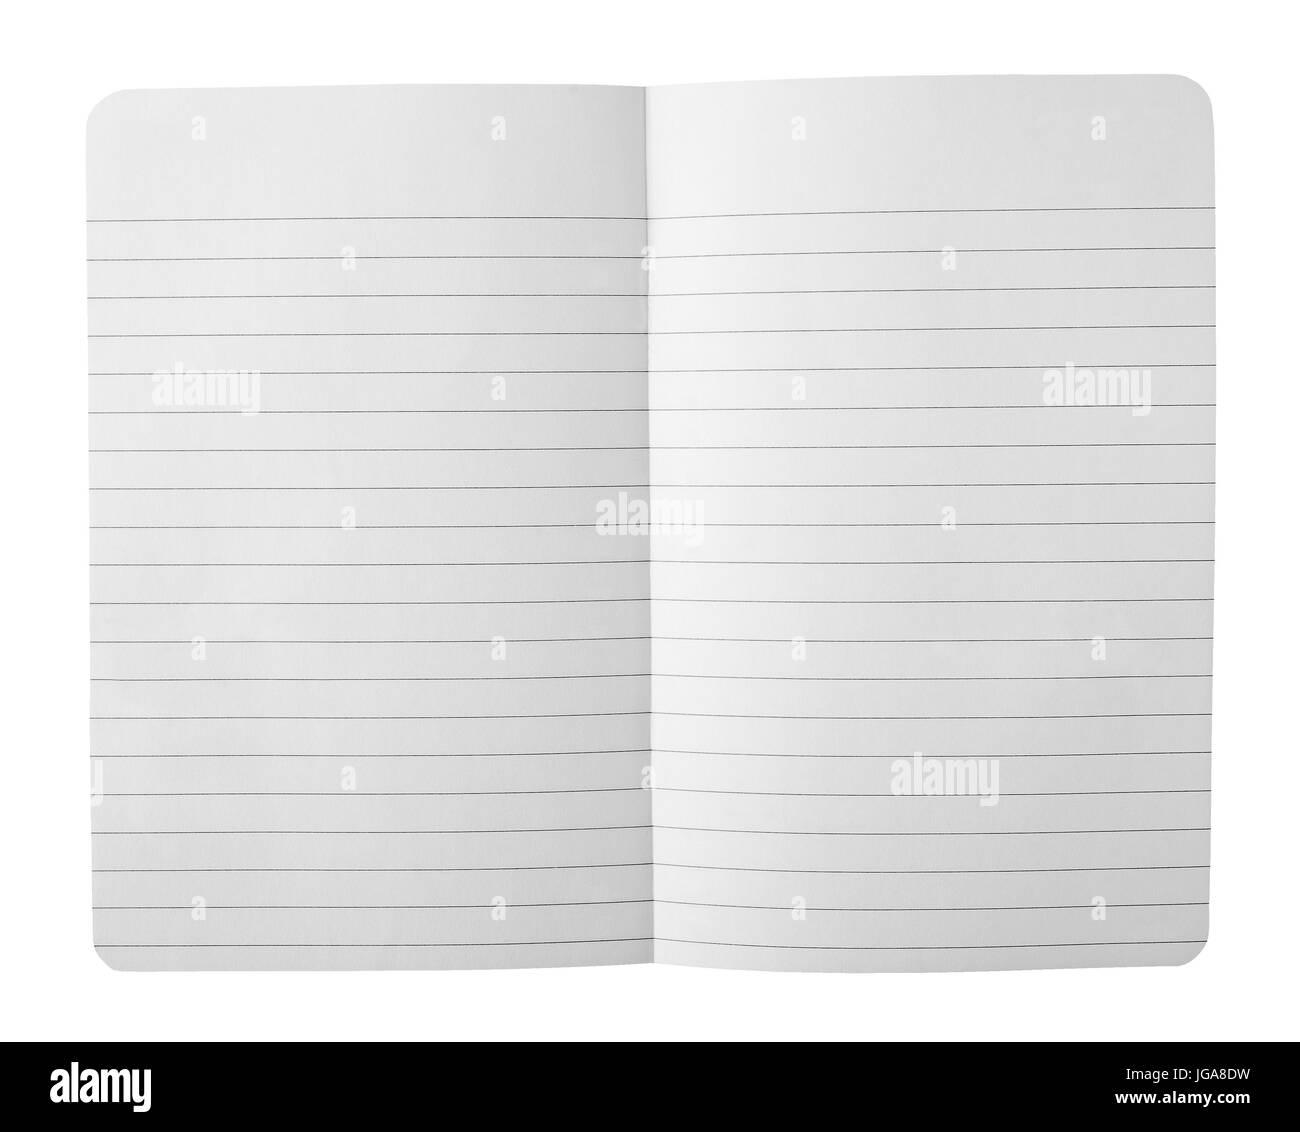 Paper sheet on white background - Stock Image